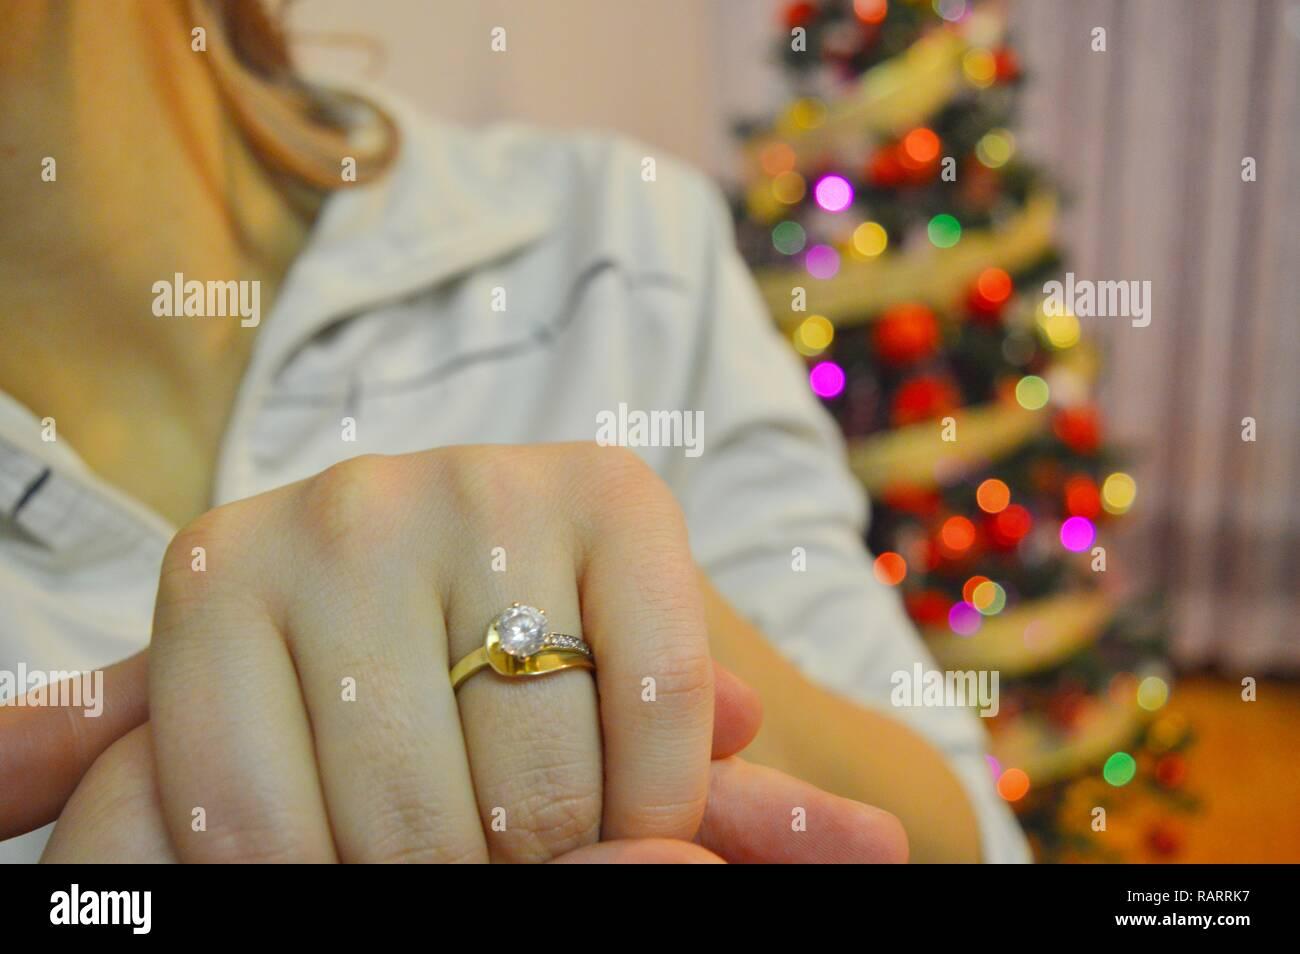 Wedding ring on a girl's hand. Proposal around Christmas. - Stock Image